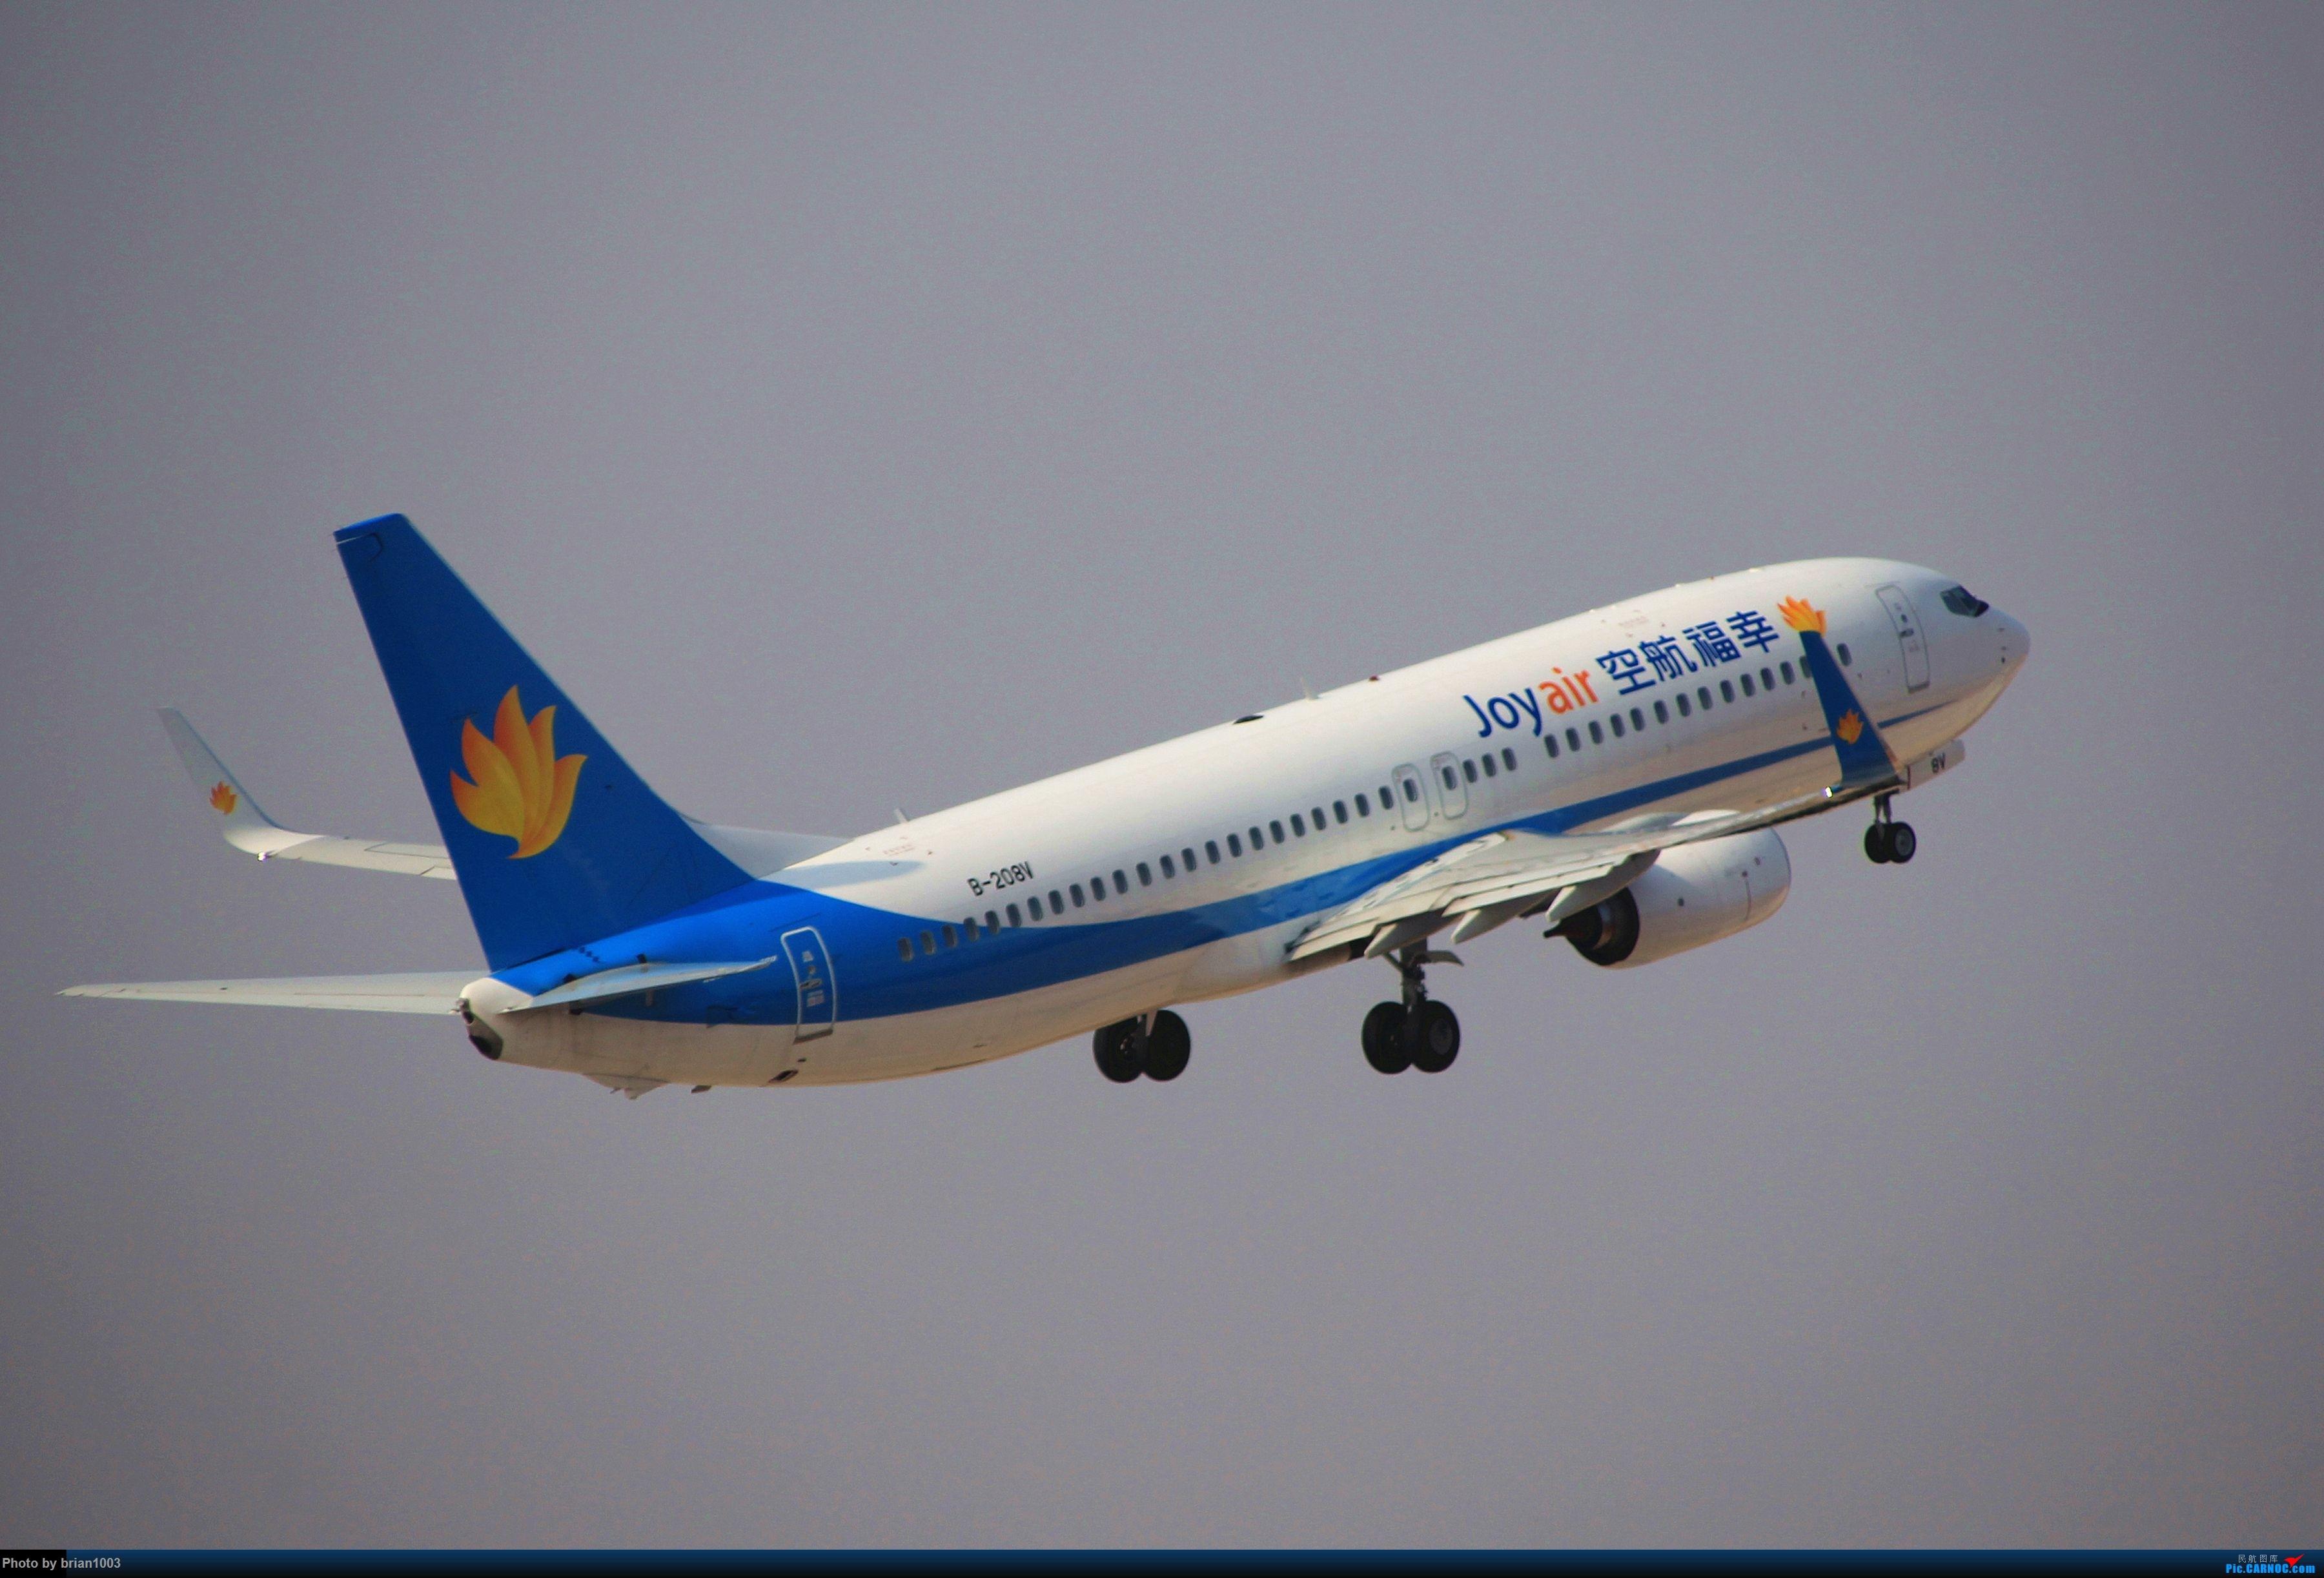 Re:[原创]WUH武汉天河机场拍机之新航季来的海航333和幸福的738 BOEING 737-800 B-208V 中国武汉天河国际机场